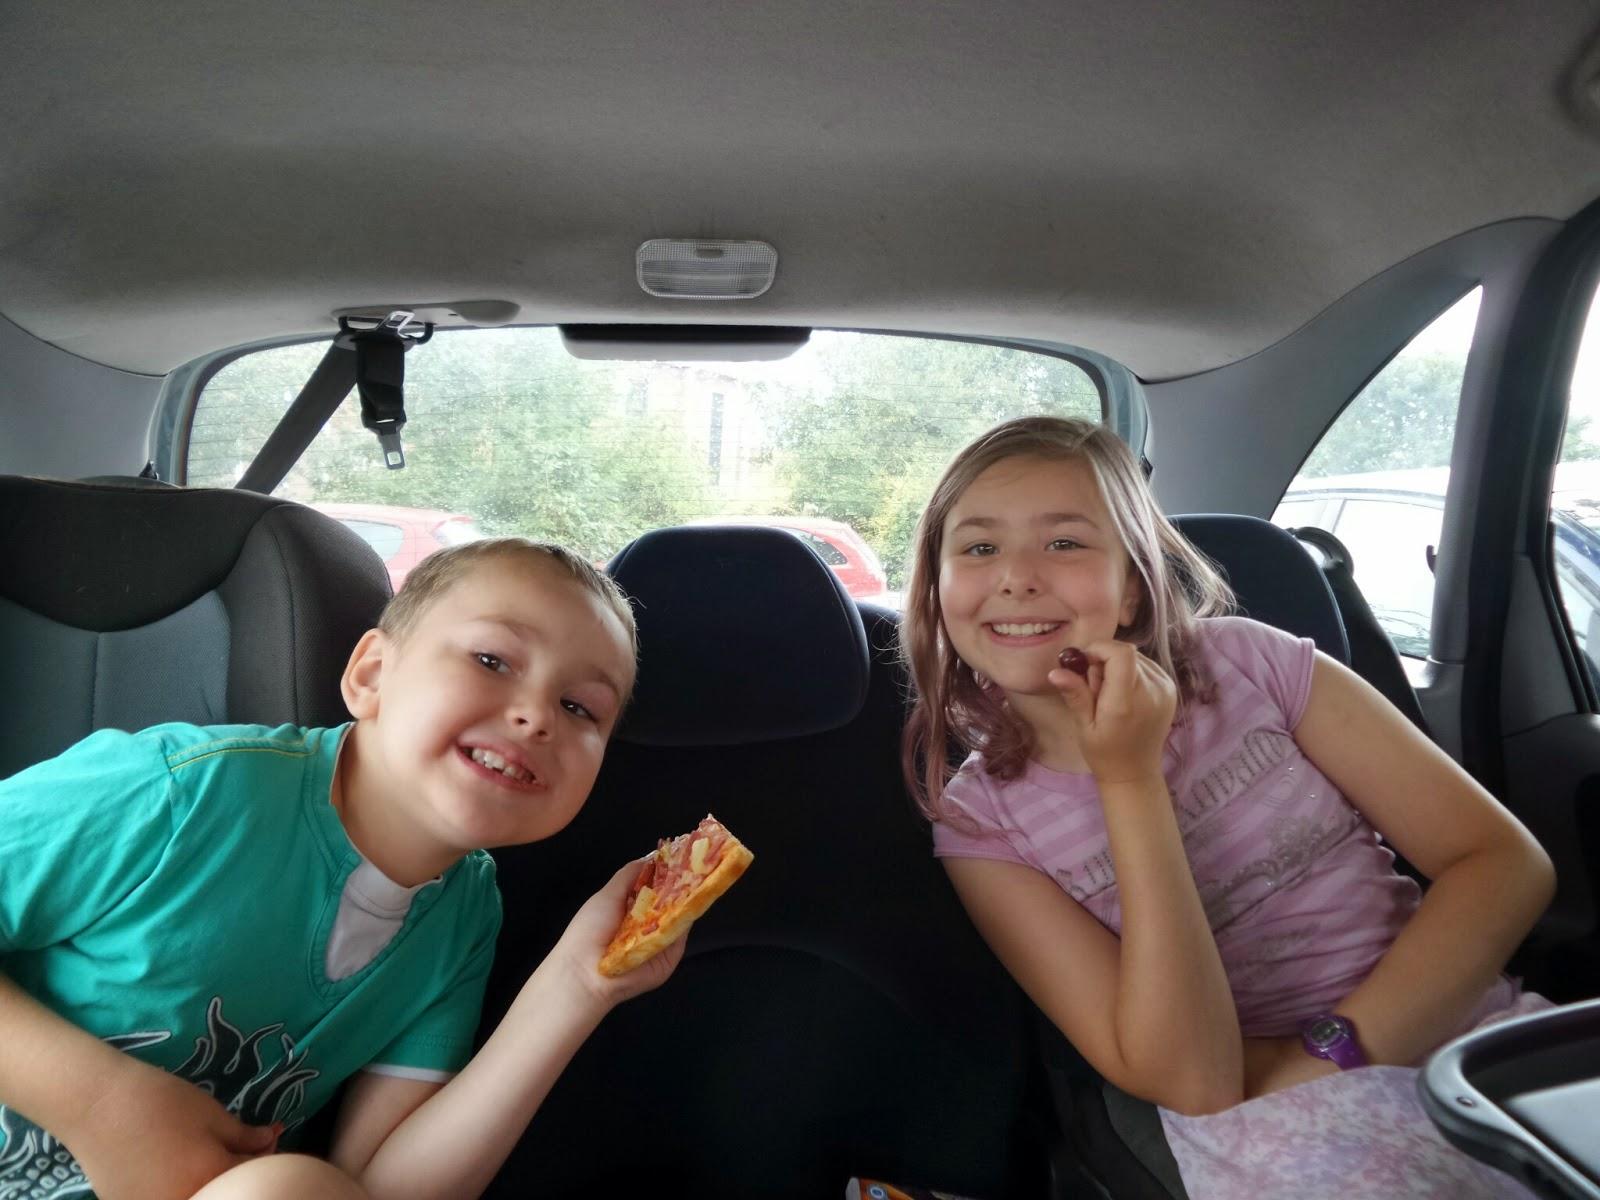 Top Ender and Big Boy eating a Car Picnic